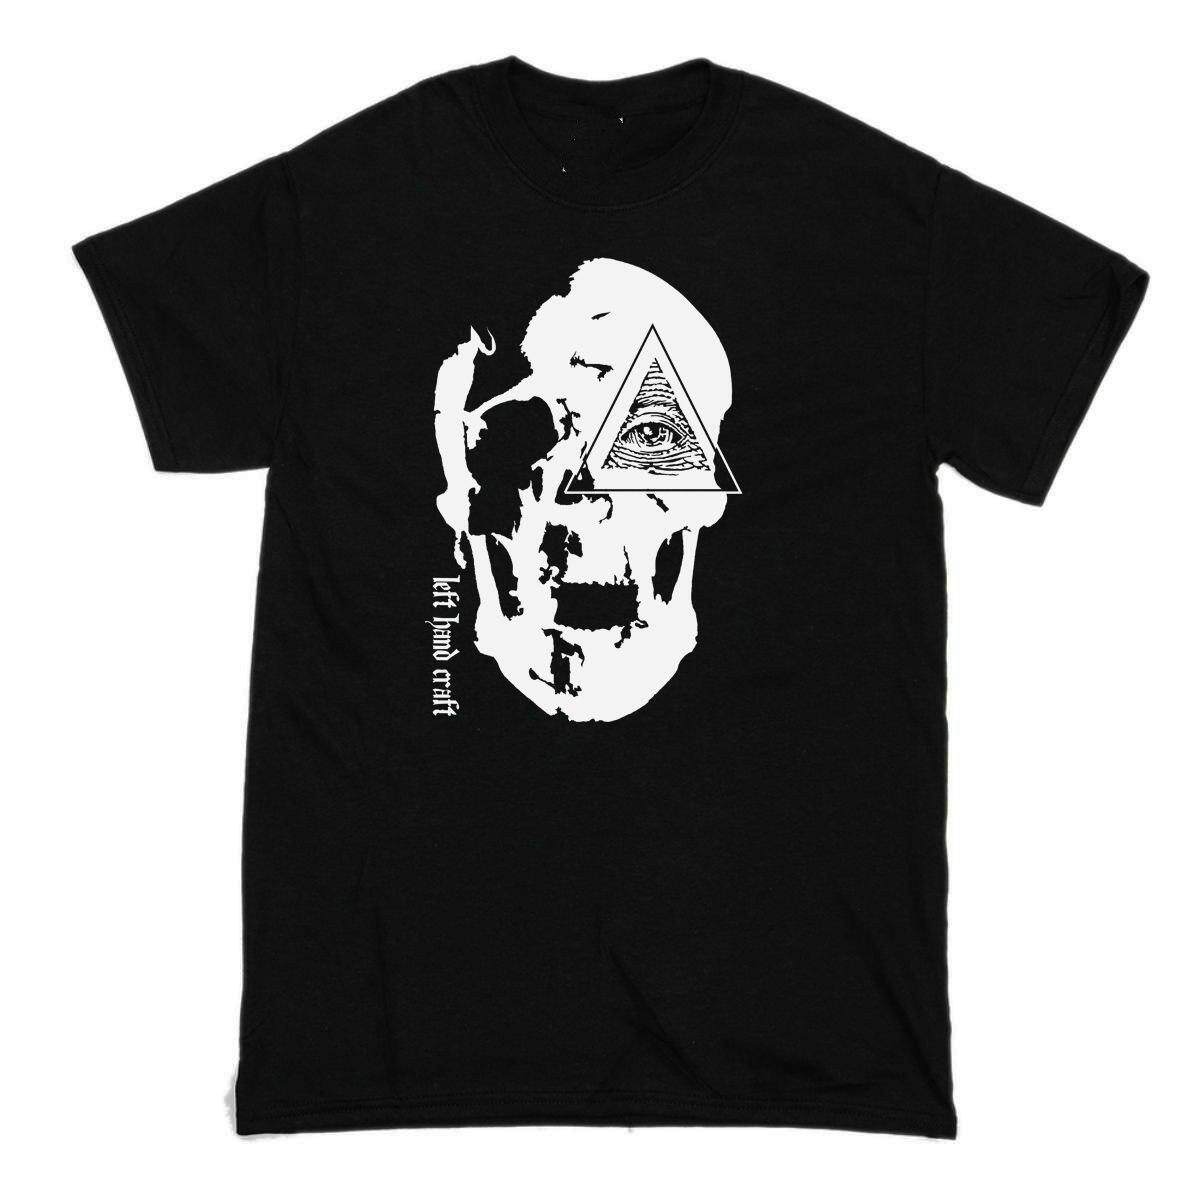 5f0515c32c YS We're Coming To Kill Your Gods - t shirt - satanic clothing pentagram